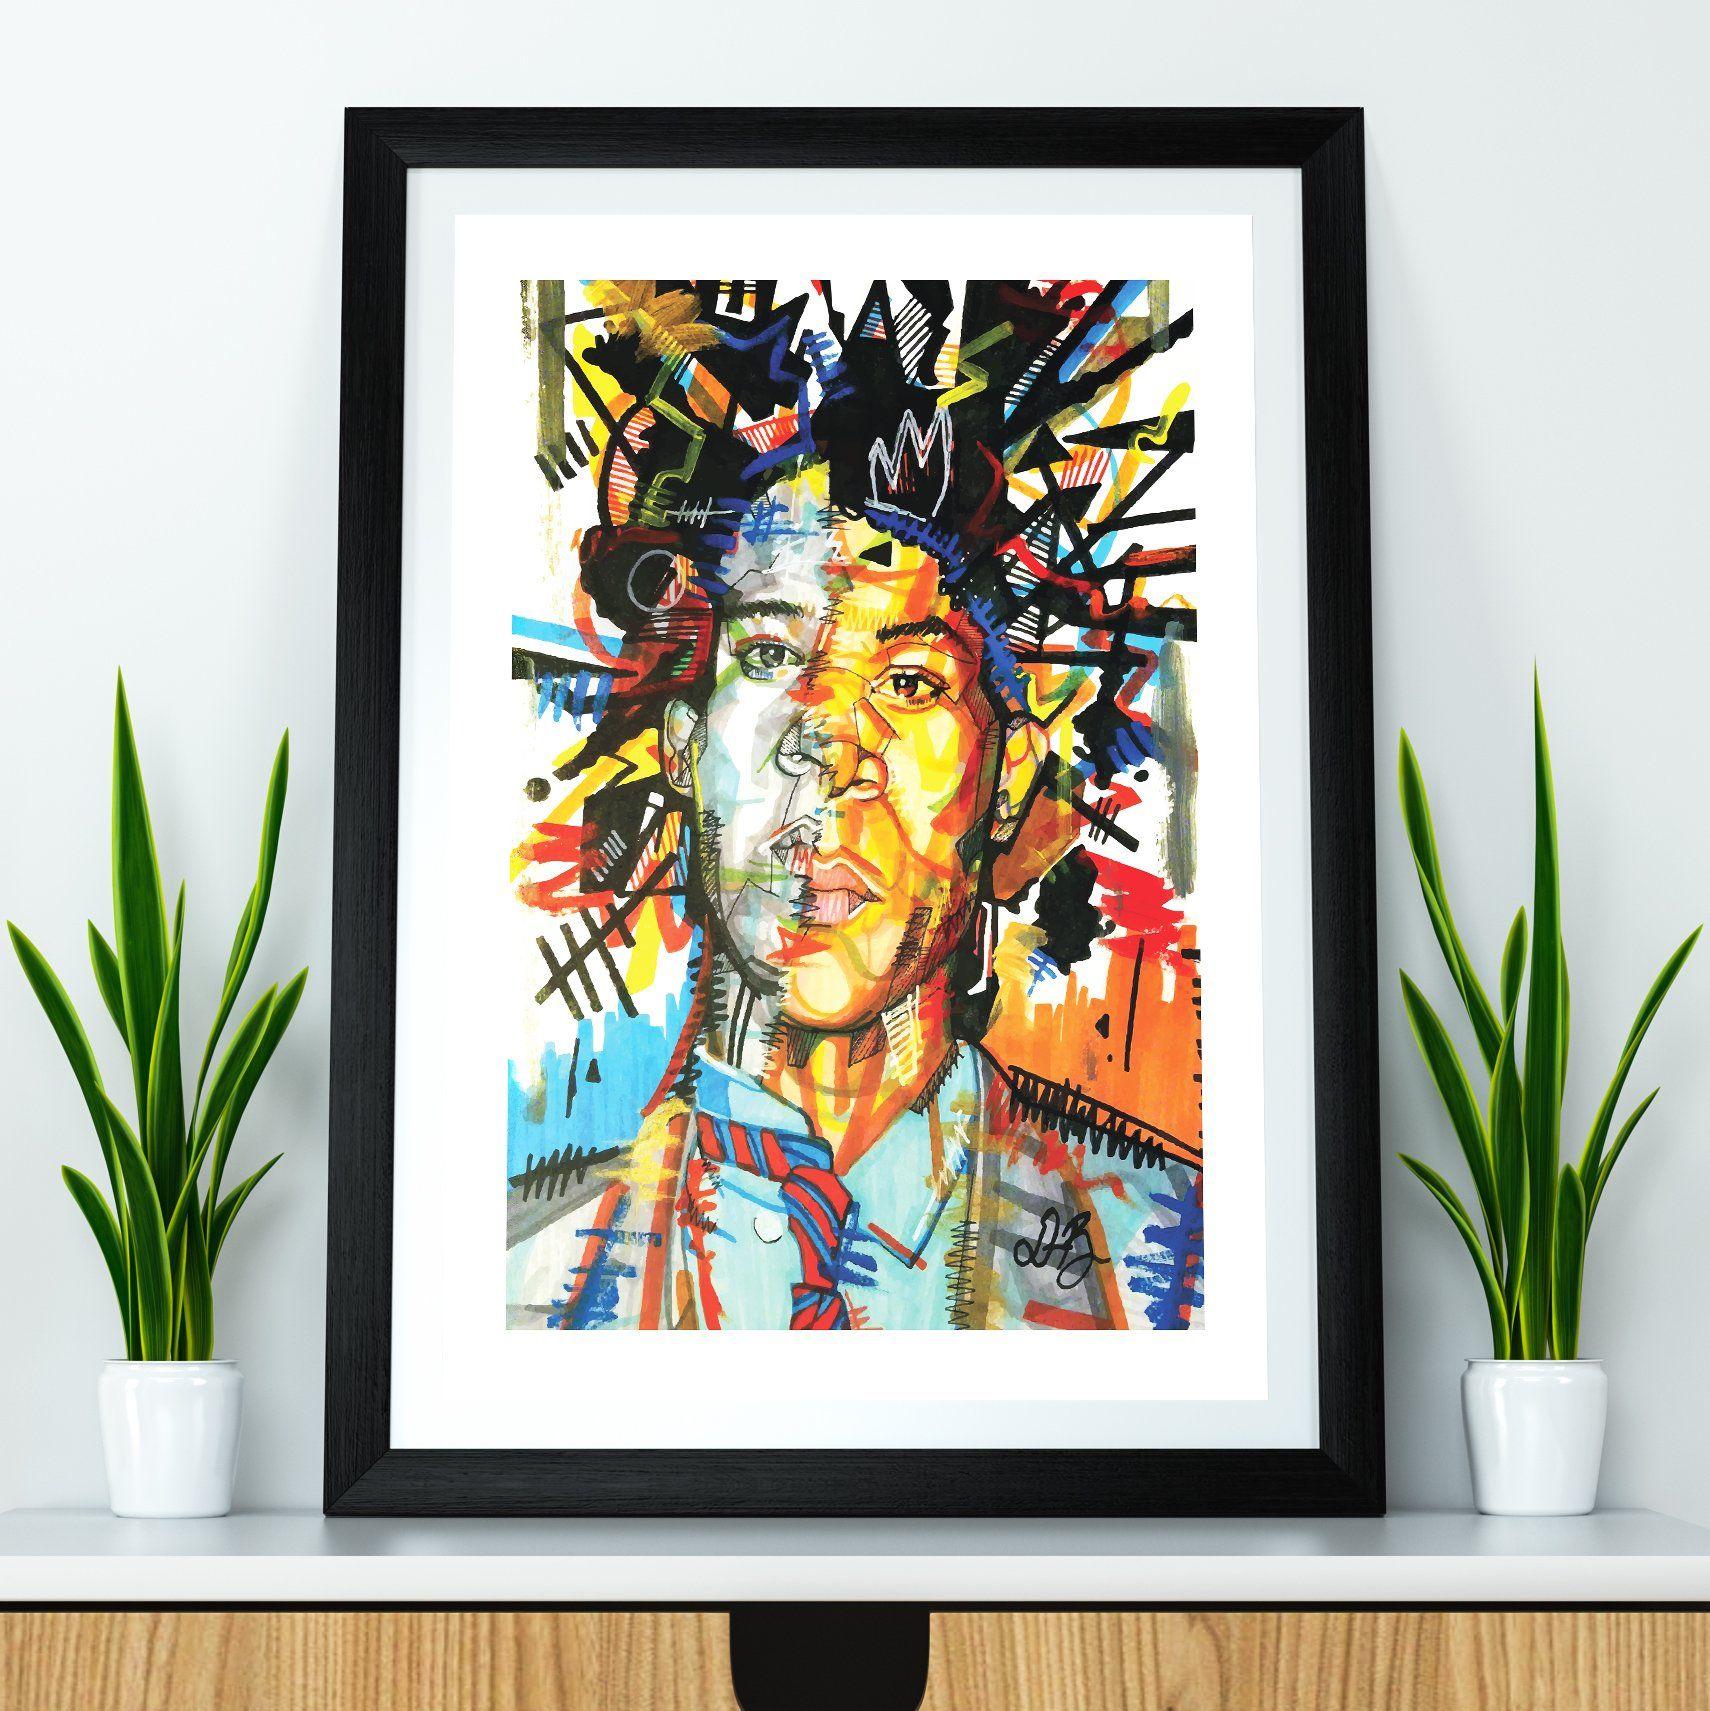 basquiat print 24x36 inches